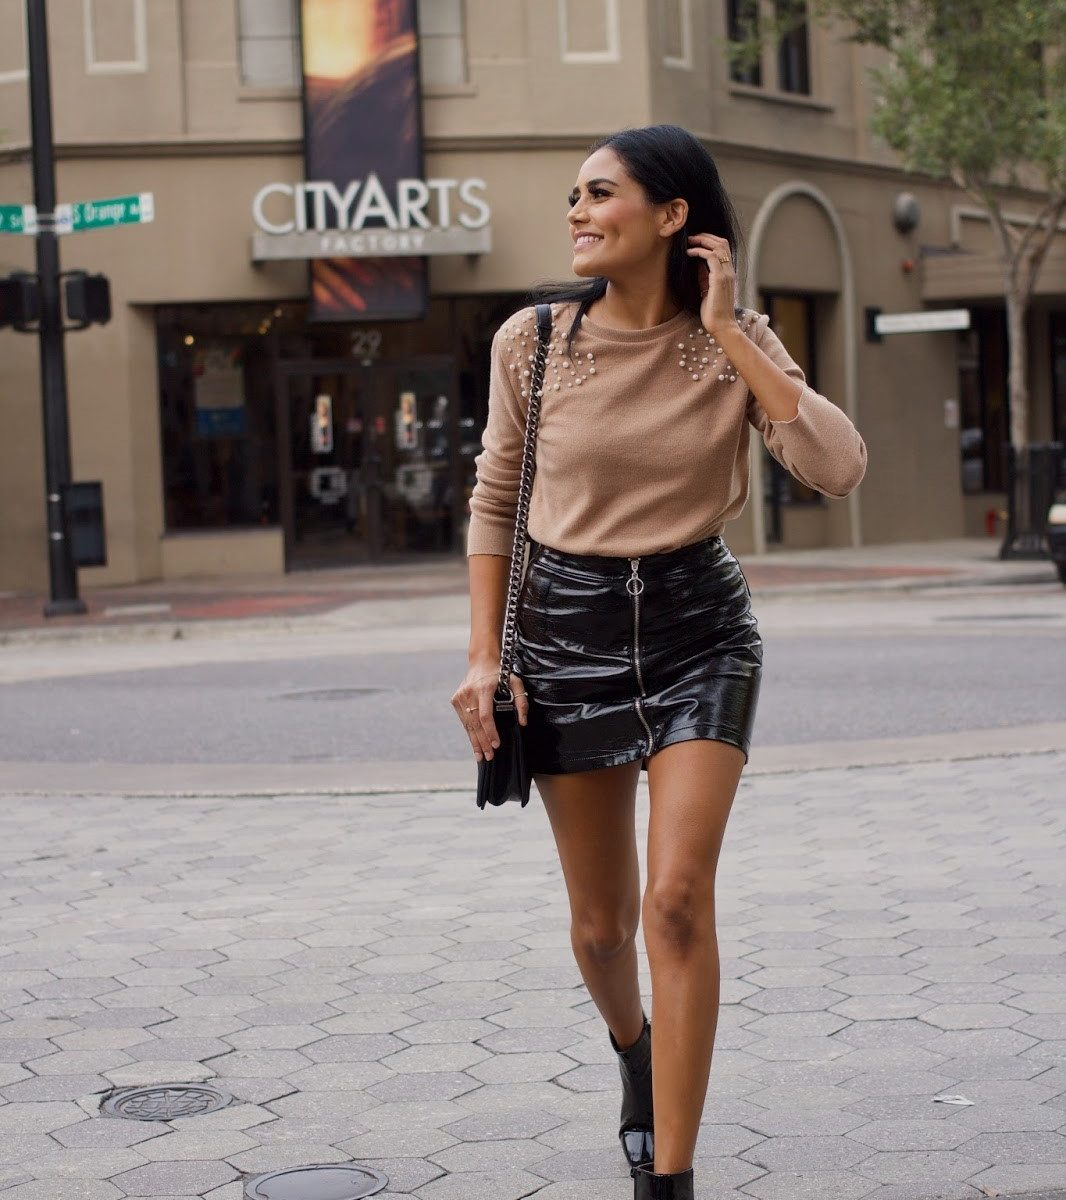 Pembagian Fashion Chic Style 2021